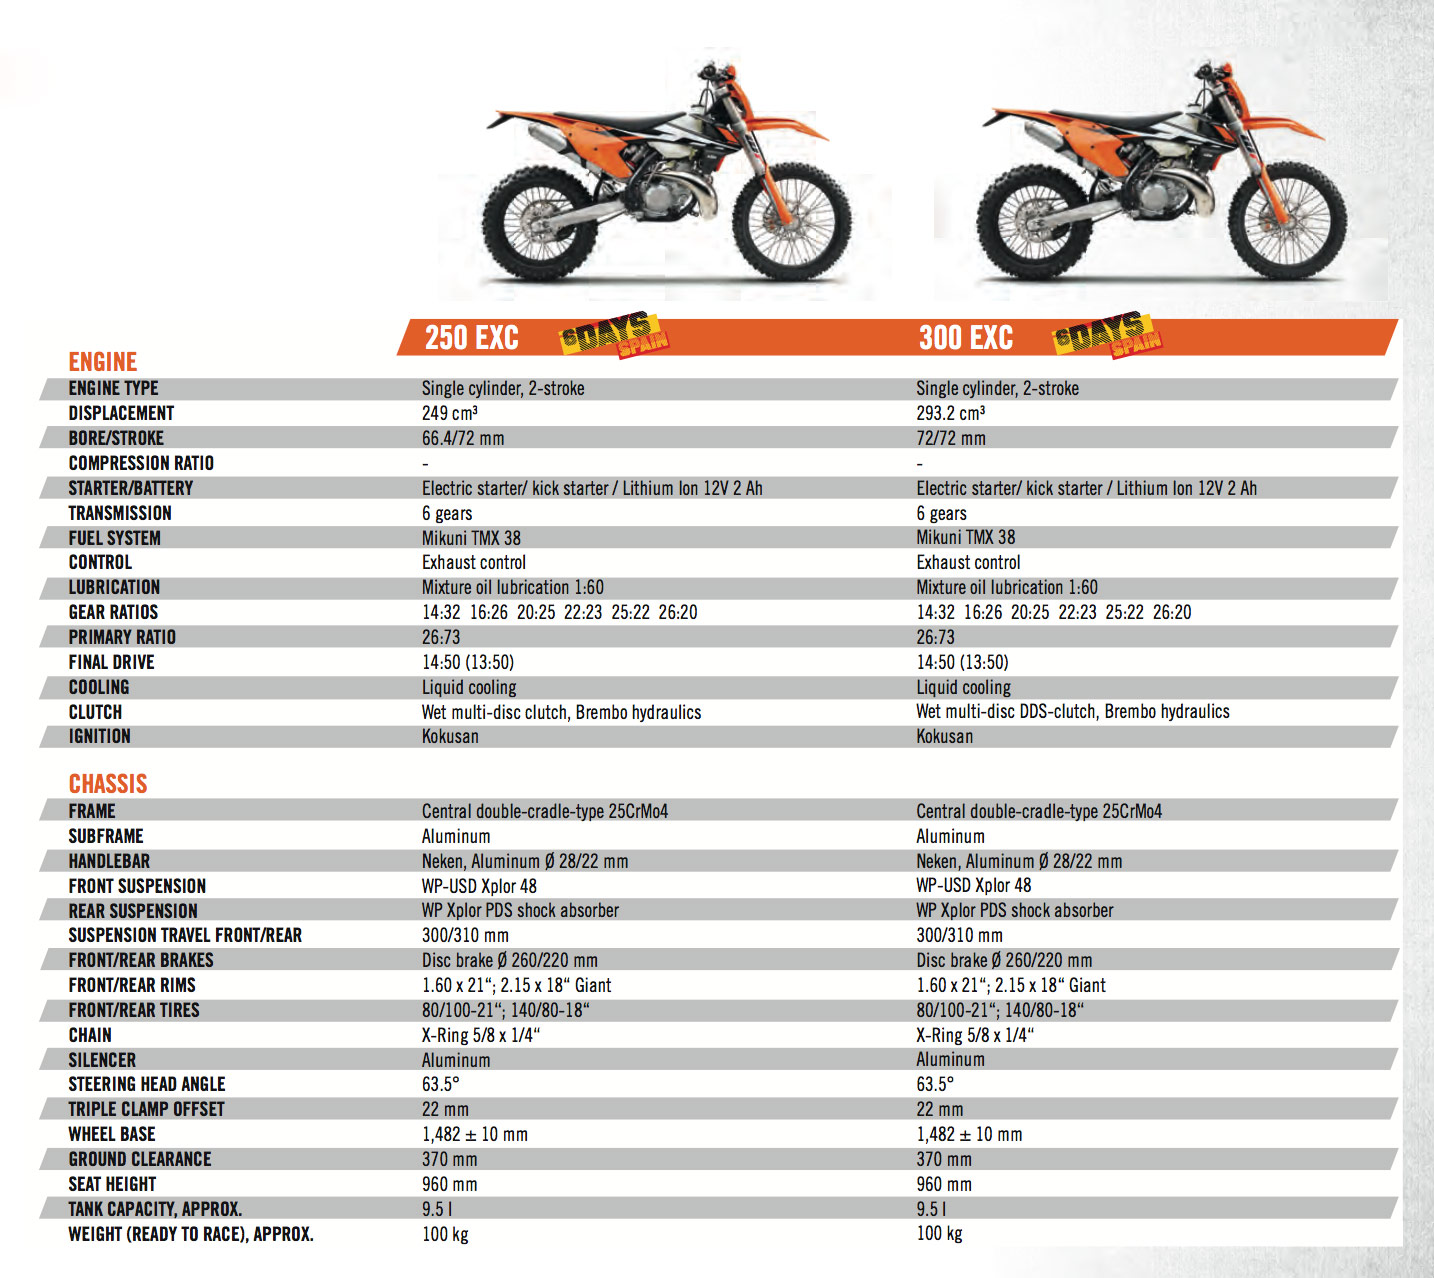 Ktm Enduro 2017 Novedades Modelos Exc Moto1pro